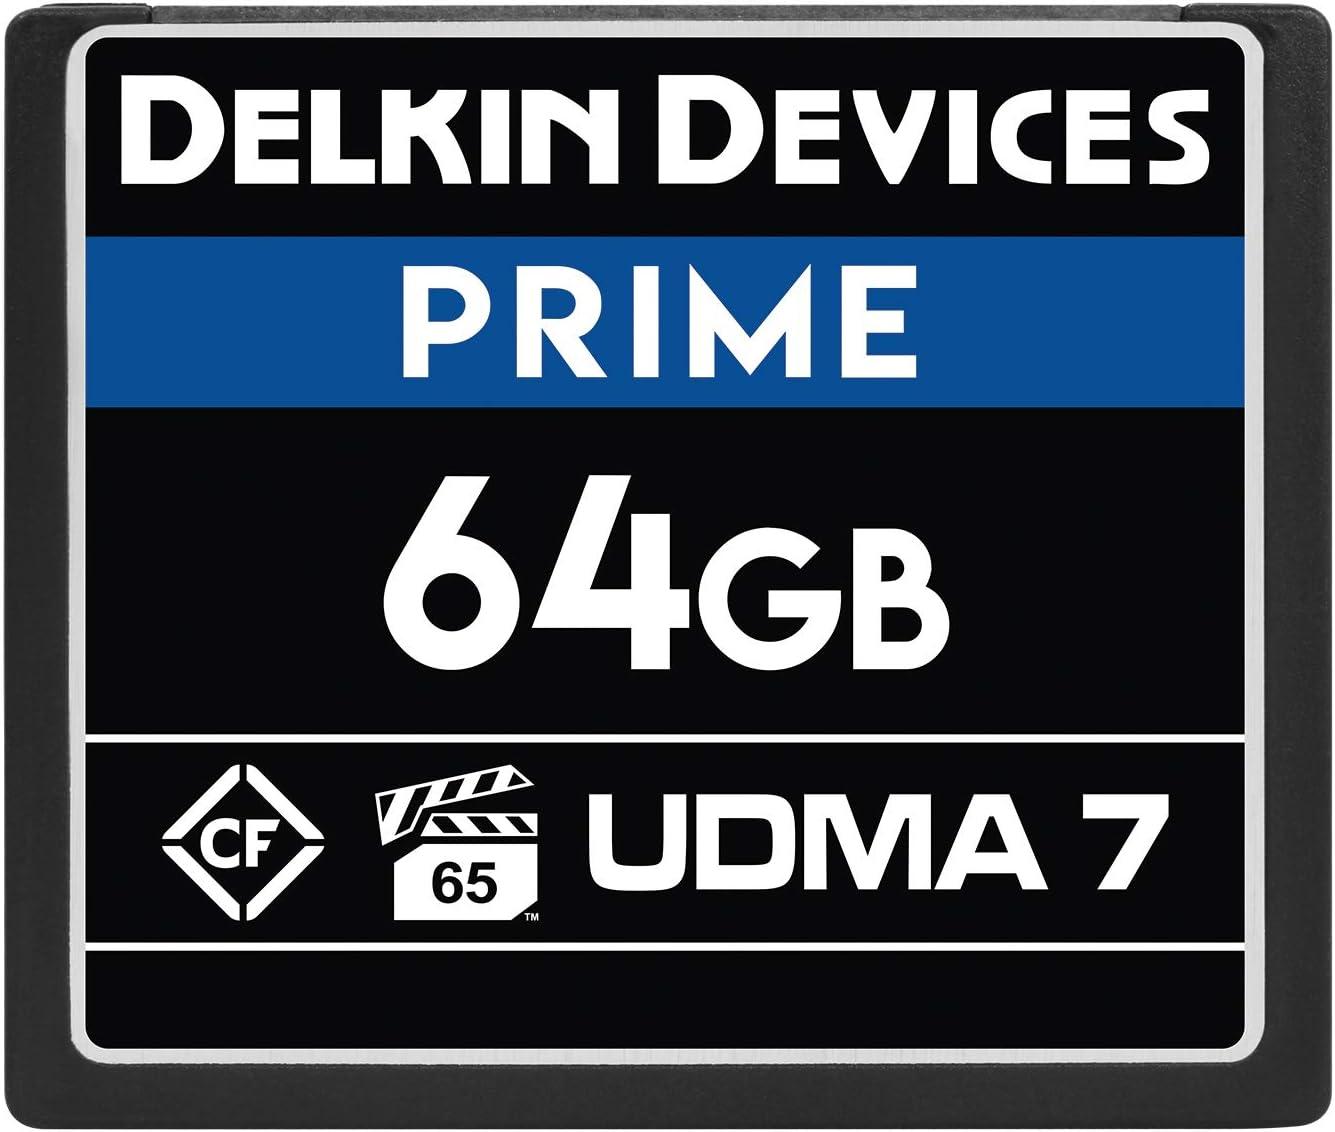 Delkin Devices 64GB Prime CompactFlash VPG-65 Memory Card (DDCFB105064G)